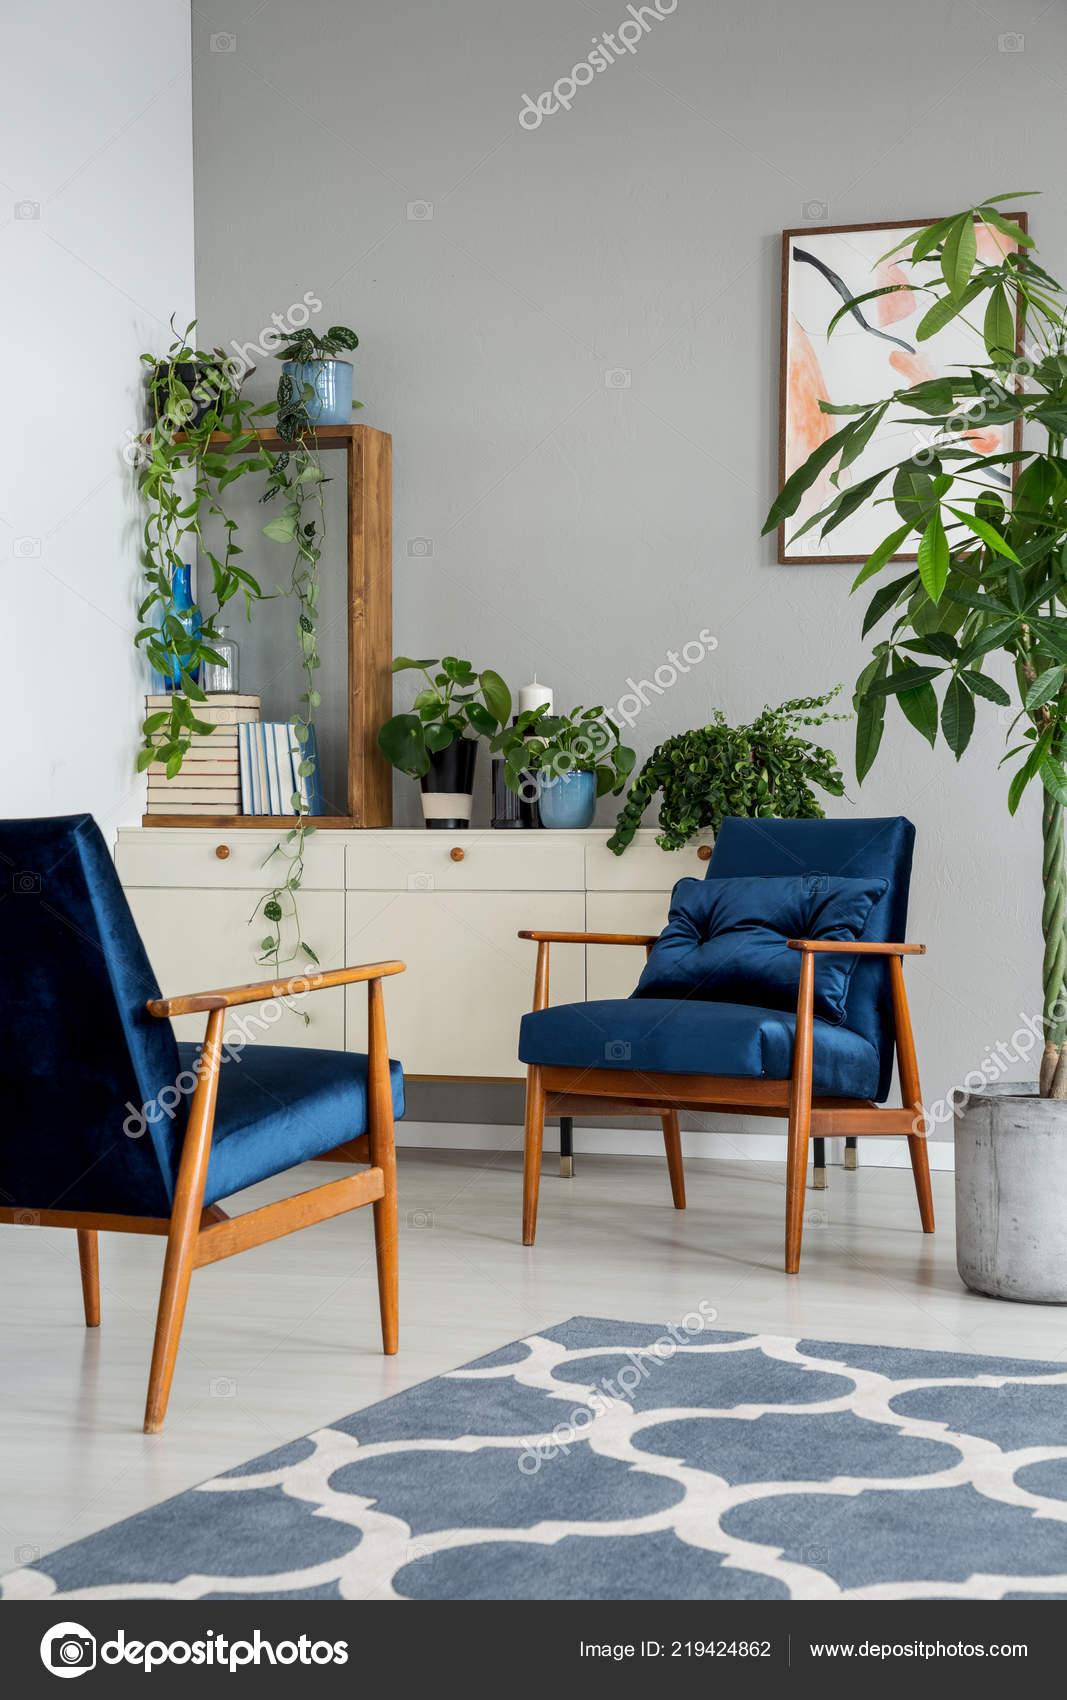 navy blue kitchen rugs california pizza app 灰色公寓内的蓝色扶手椅旁边有图案地毯橱柜上有植物真实照片 图库照片 灰色公寓内的蓝色扶手椅旁边有图案地毯橱柜上有植物